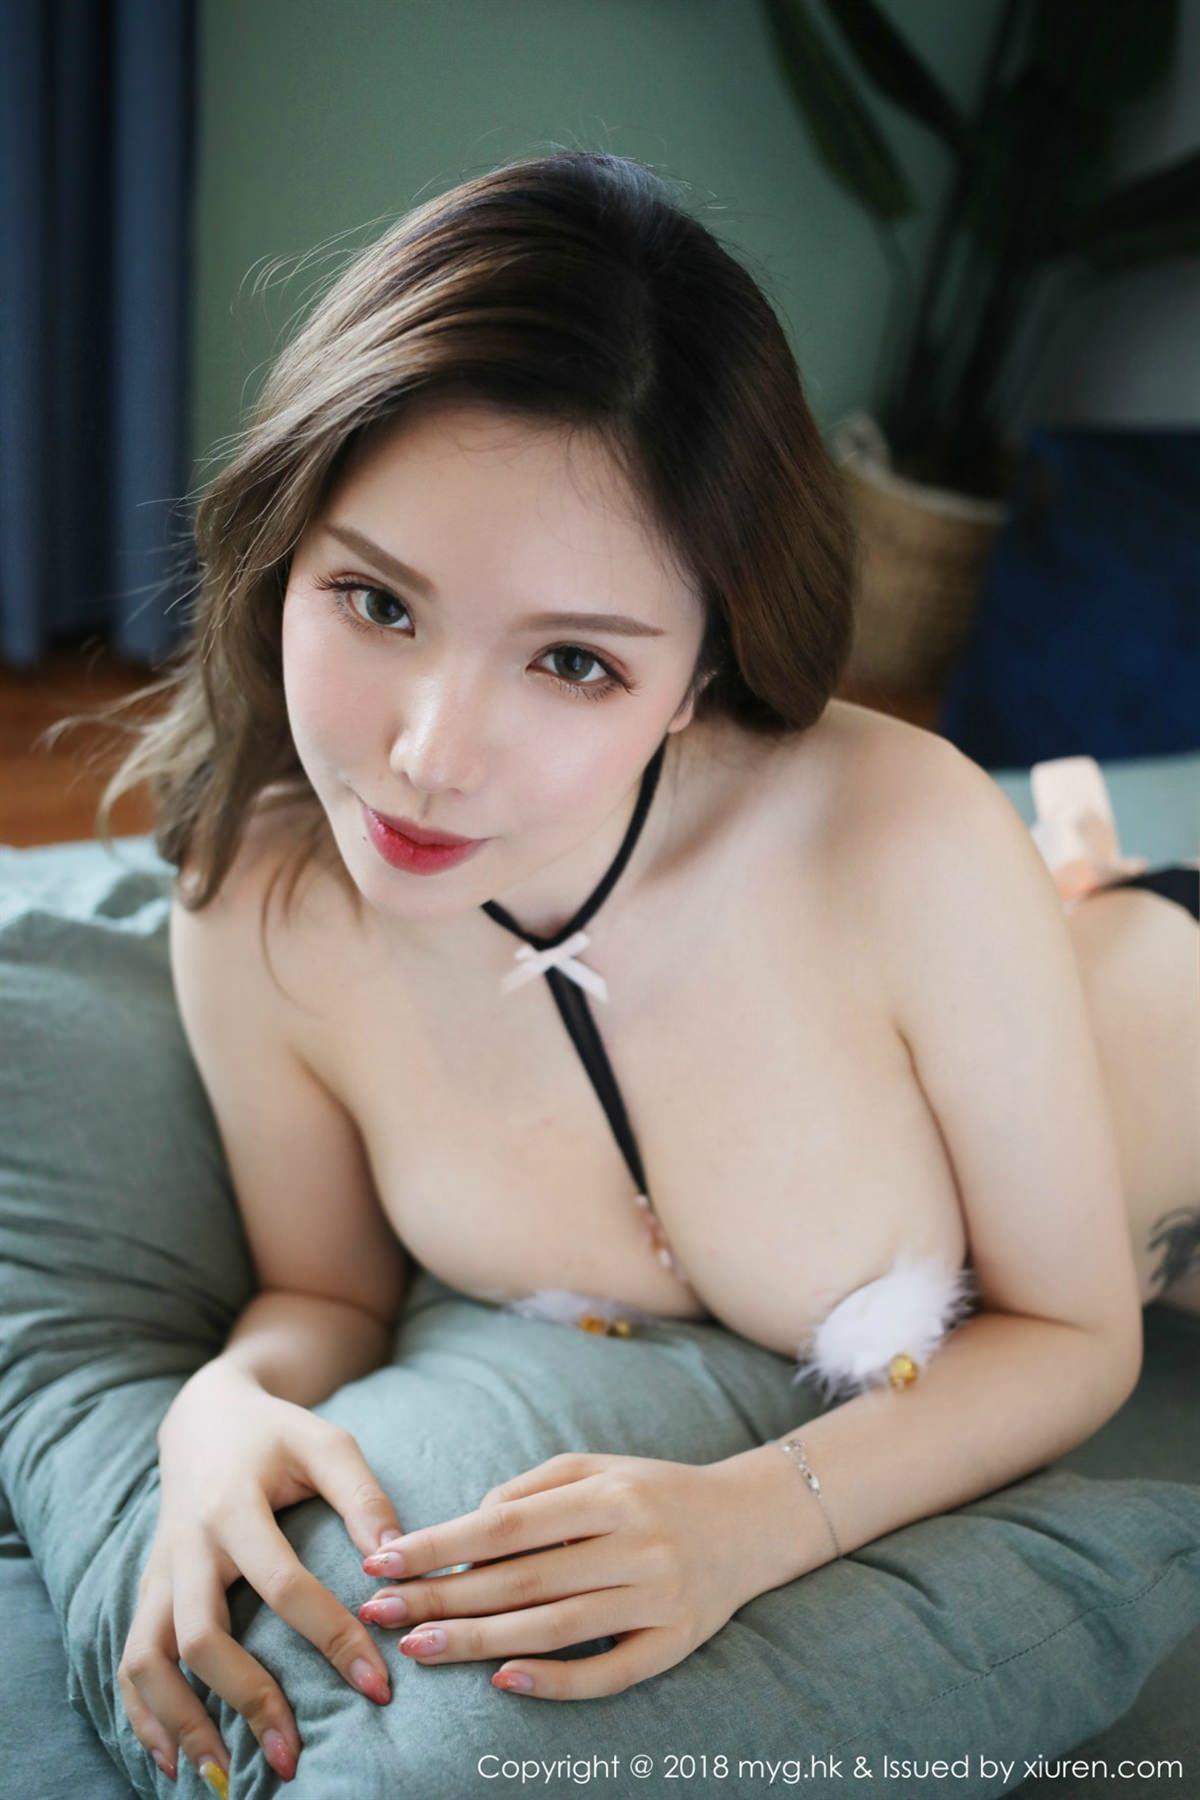 MyGirl Vol.302 45P, Huang Le Ran, mygirl